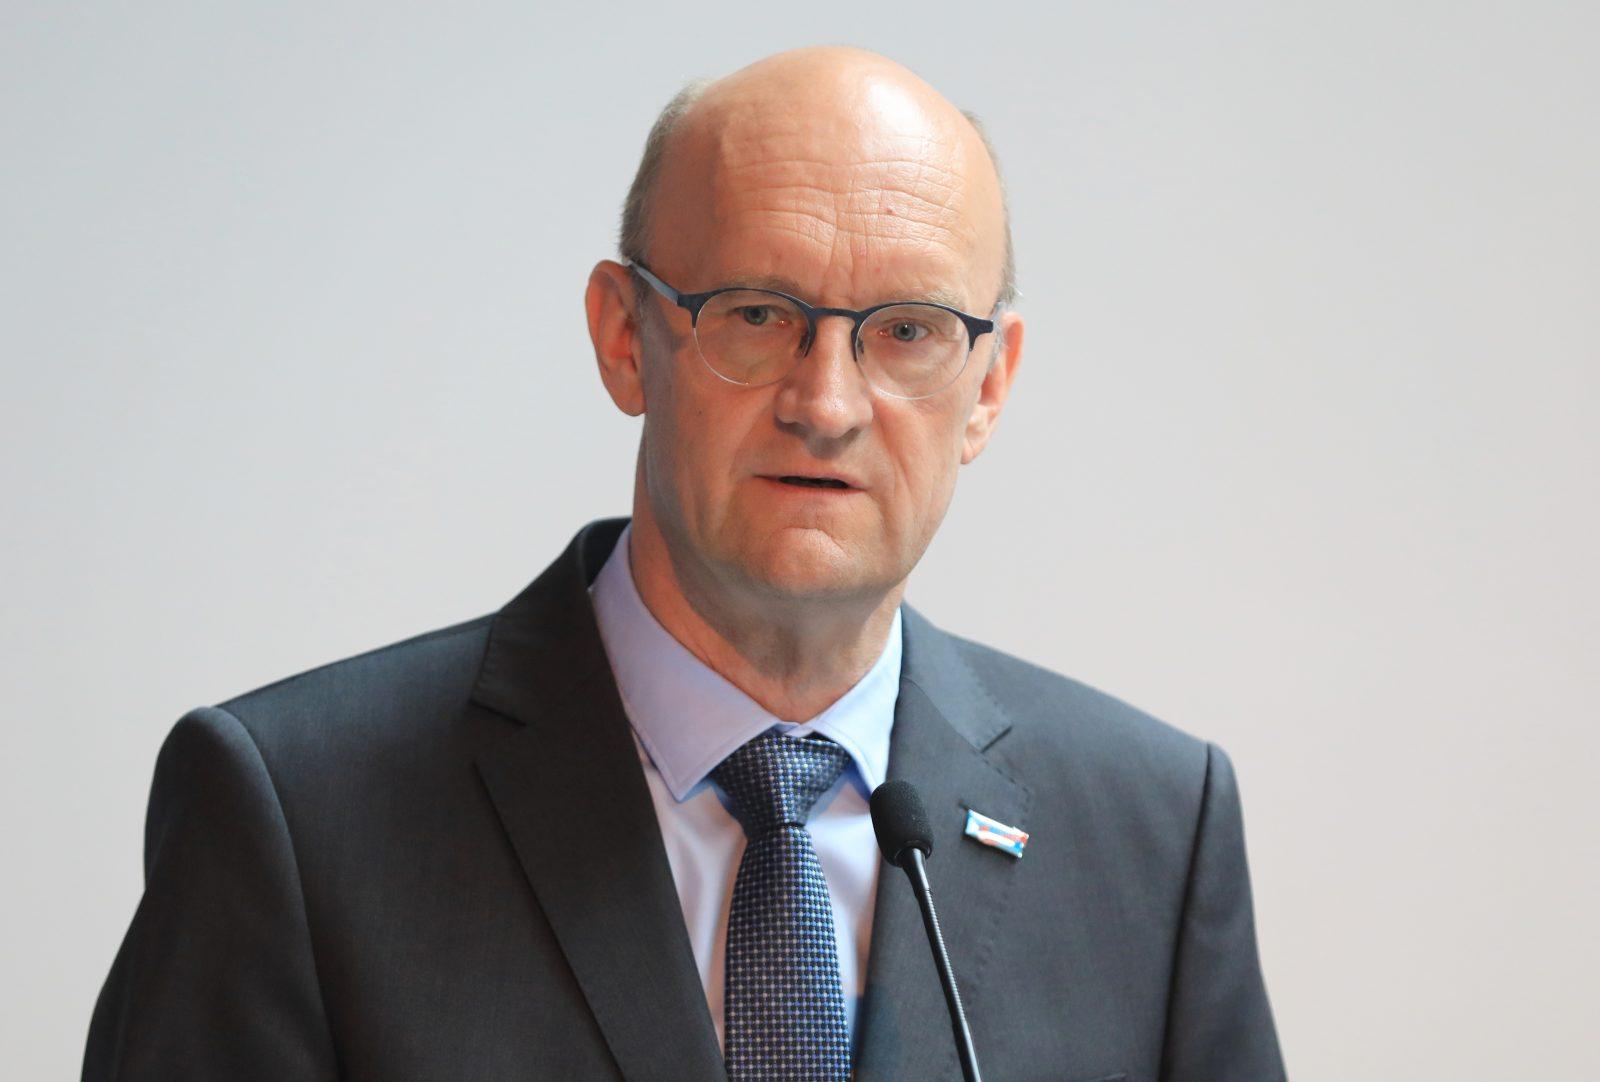 Bundestagsabgeordneter Frank Pasemann